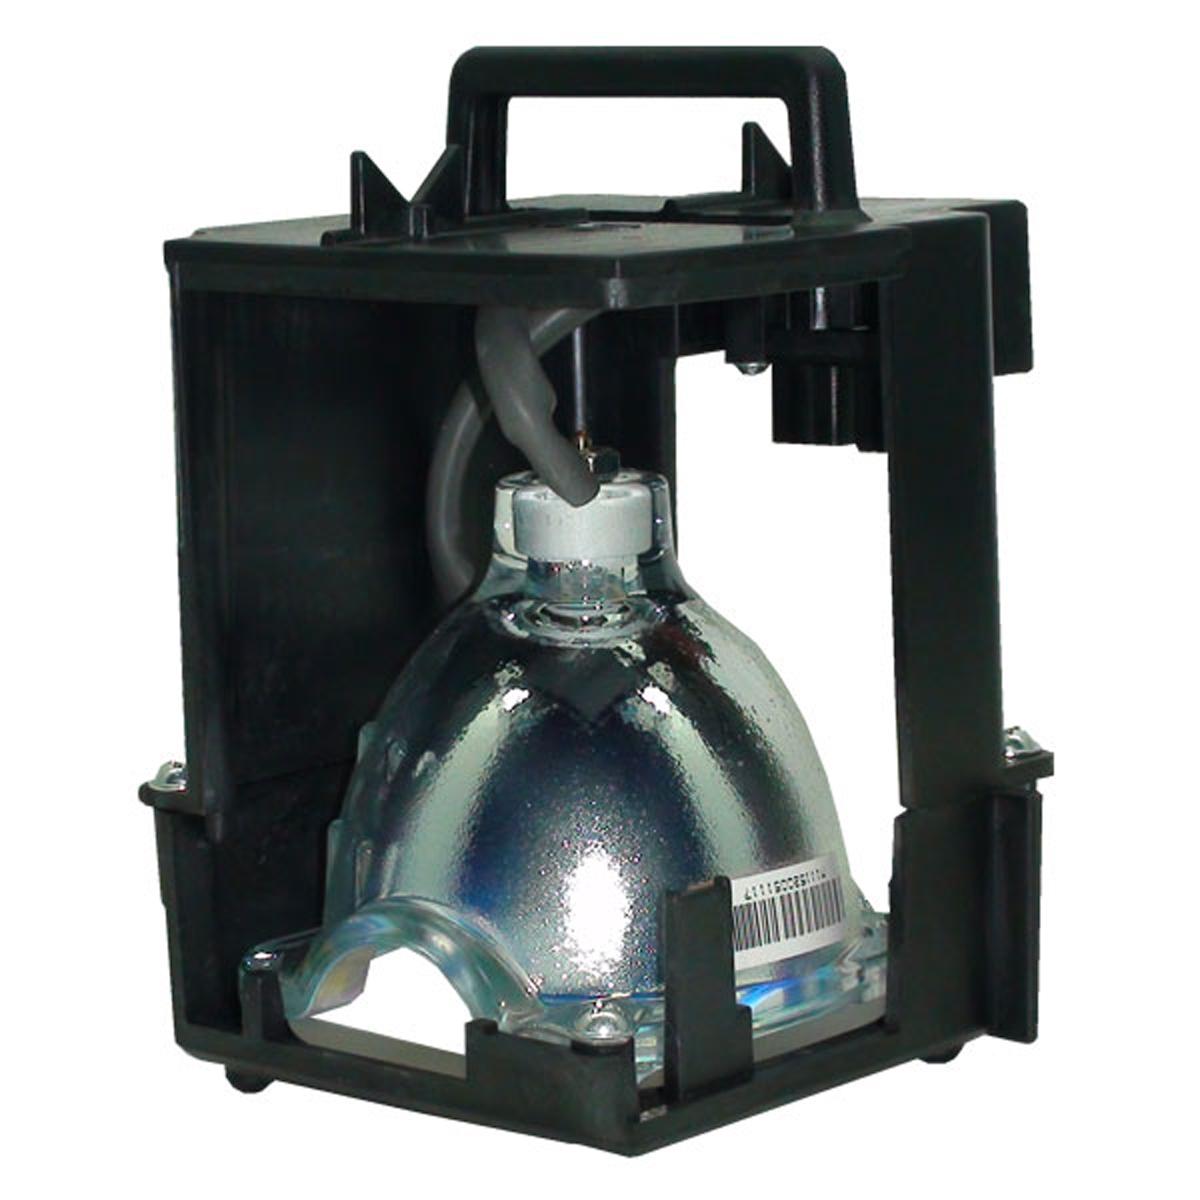 01795a bulb cartridge for samsung hlt5076sx tv lamp rptv bulbs ebay. Black Bedroom Furniture Sets. Home Design Ideas